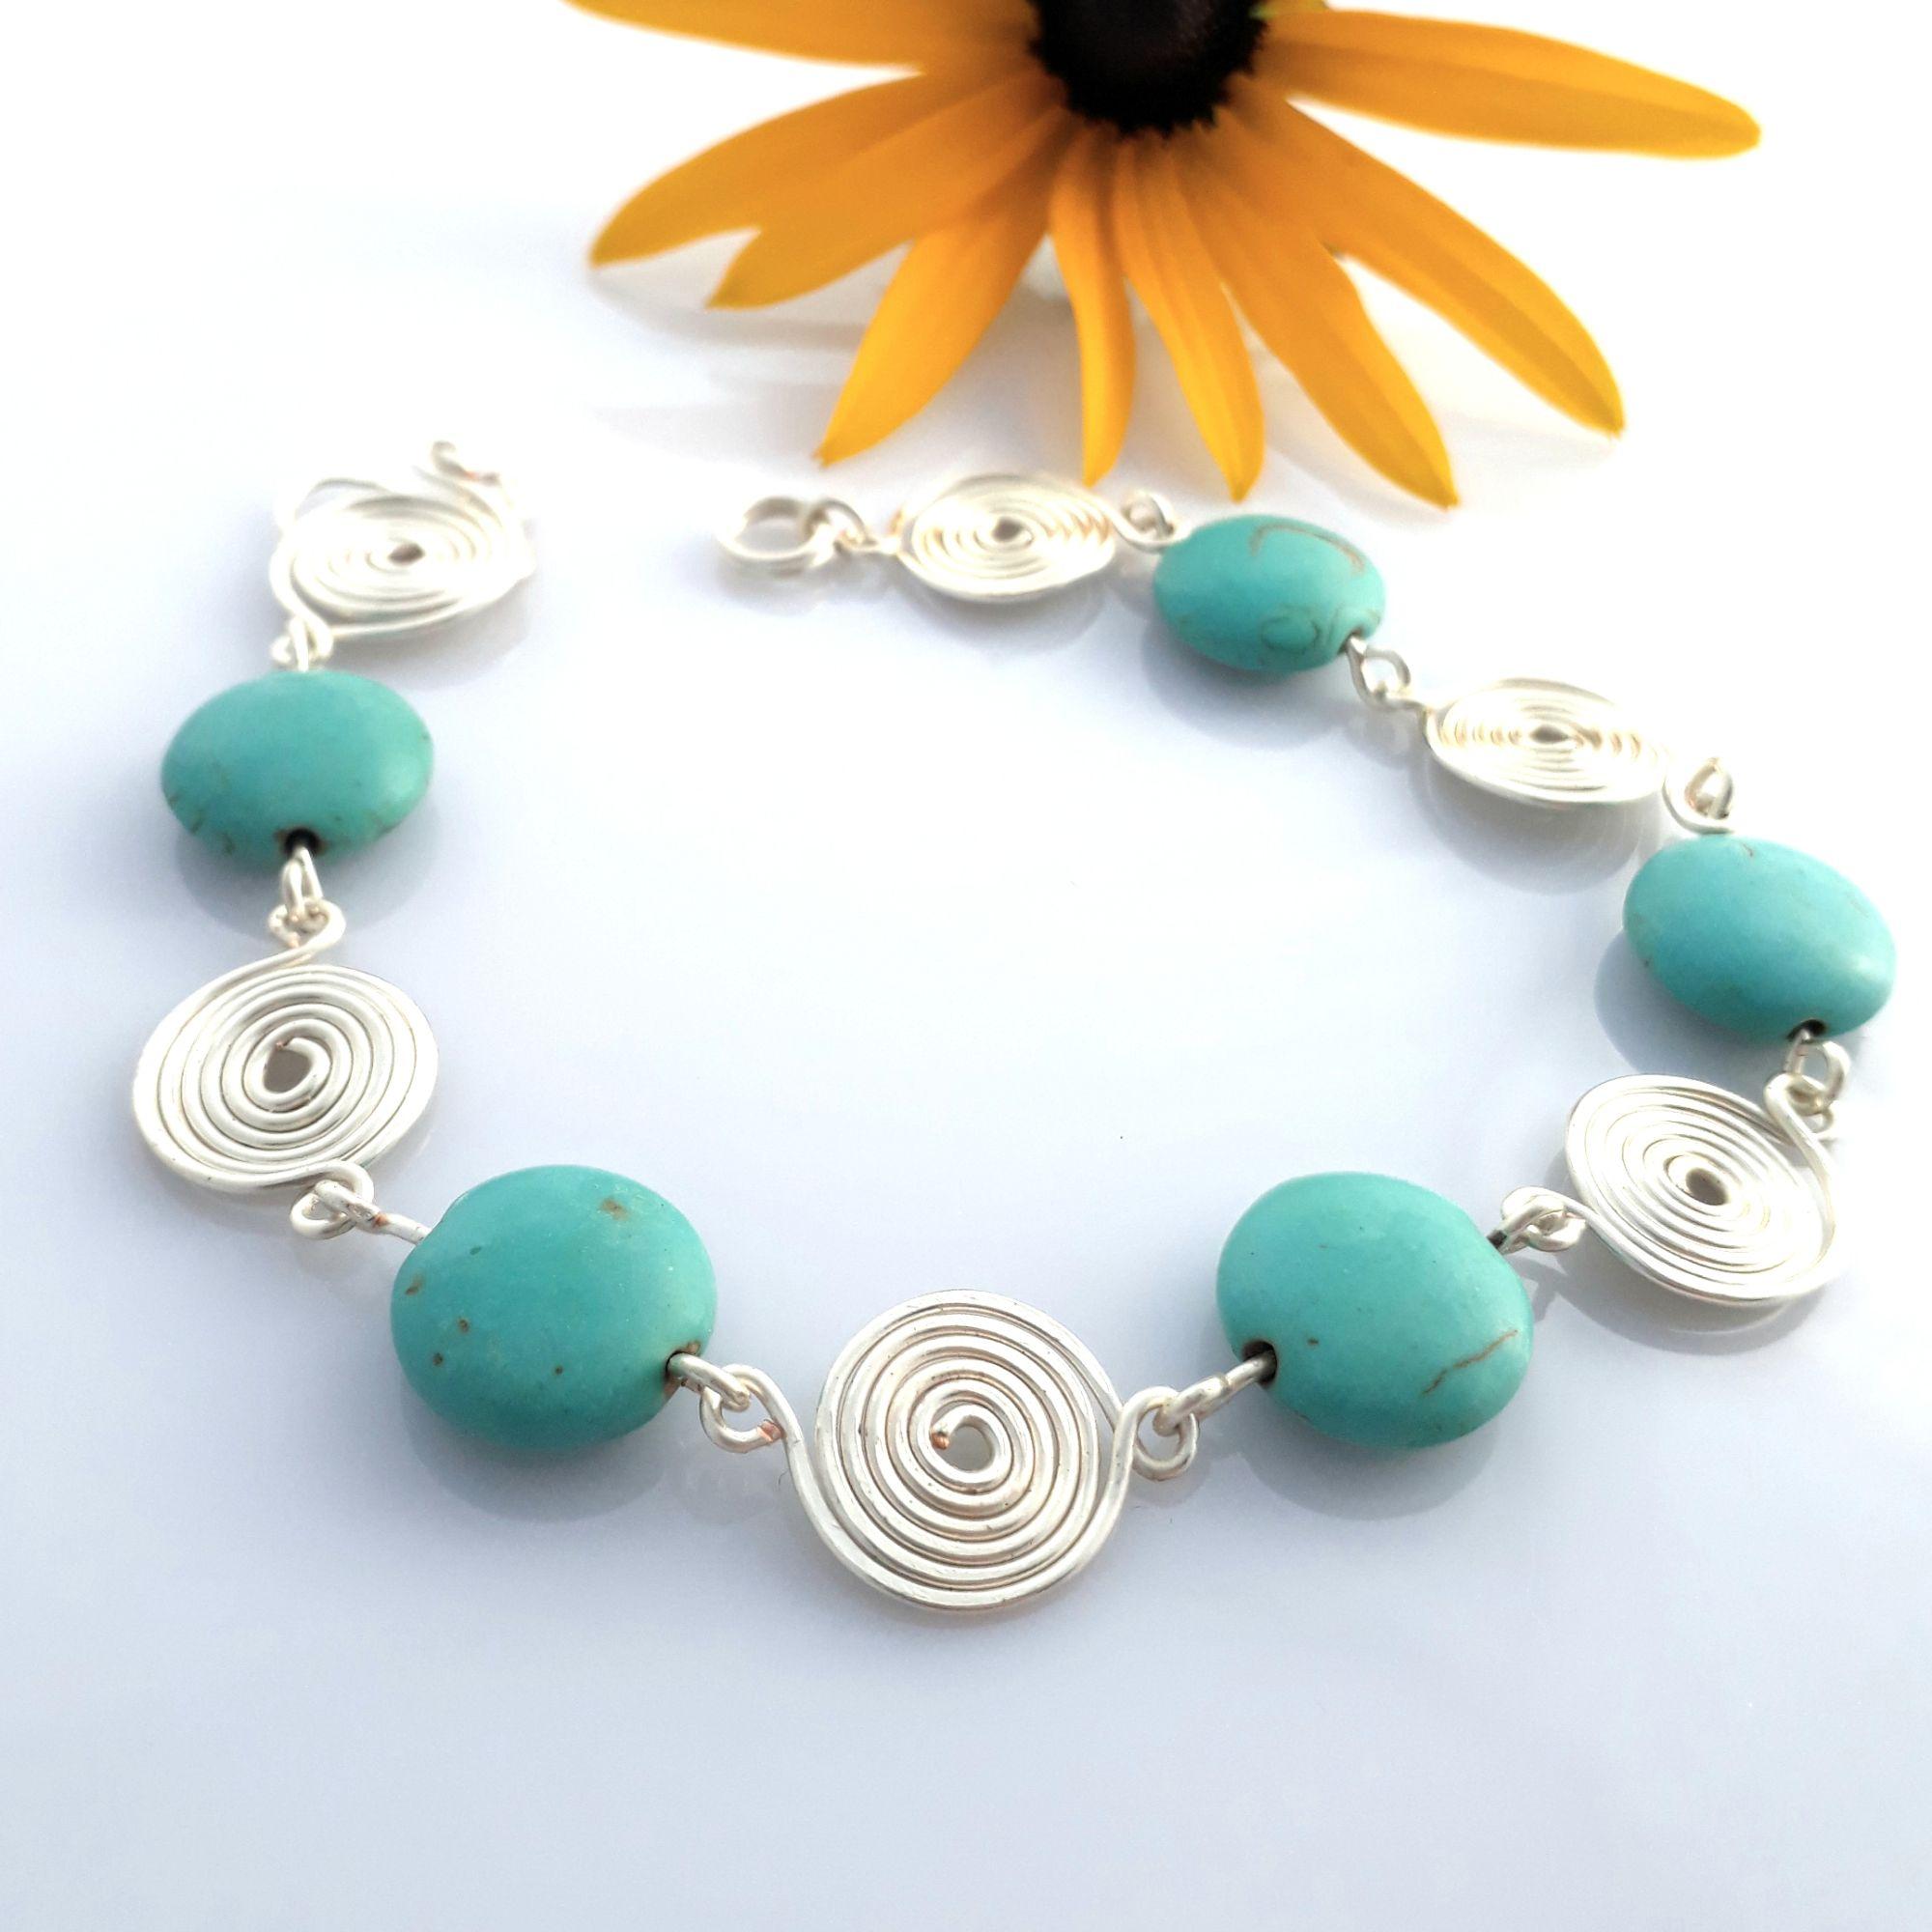 Turquoise silver spiral bracelet